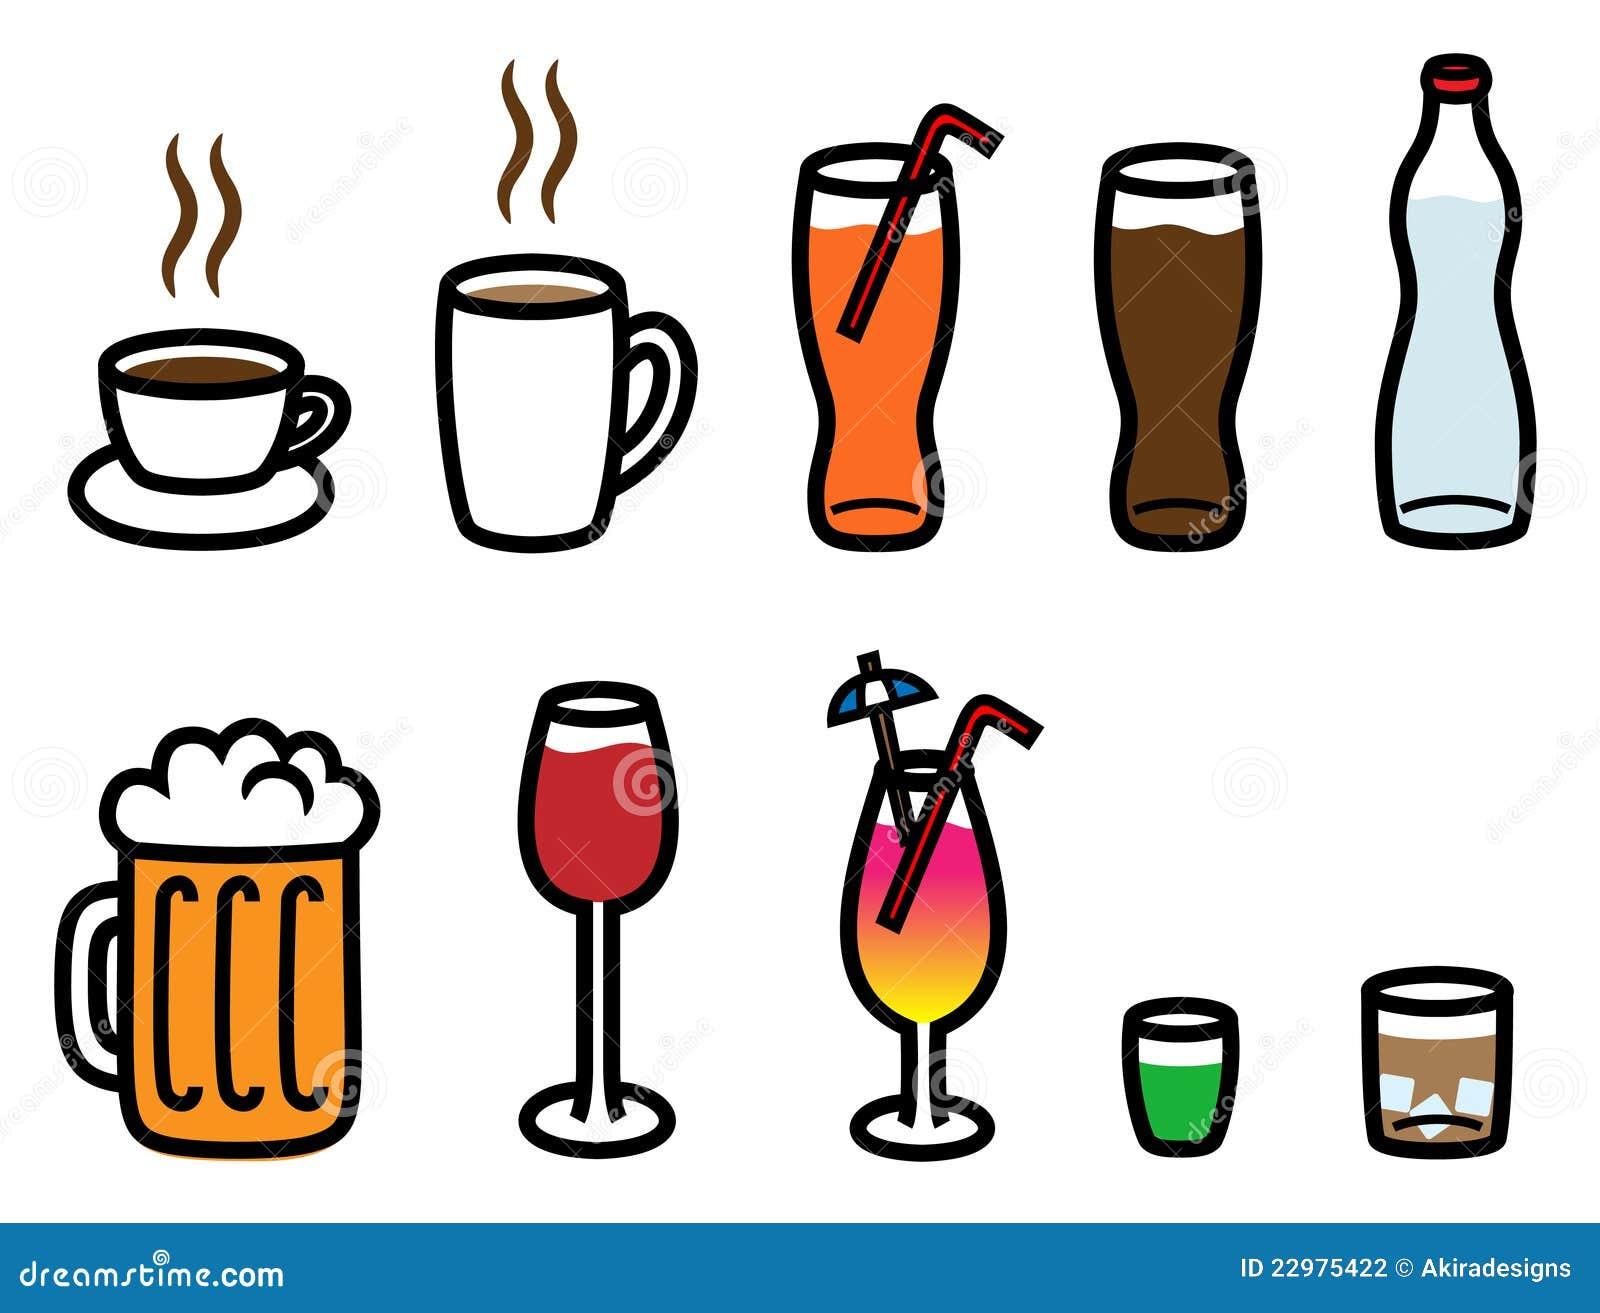 Coffee Based Liquor Drinks